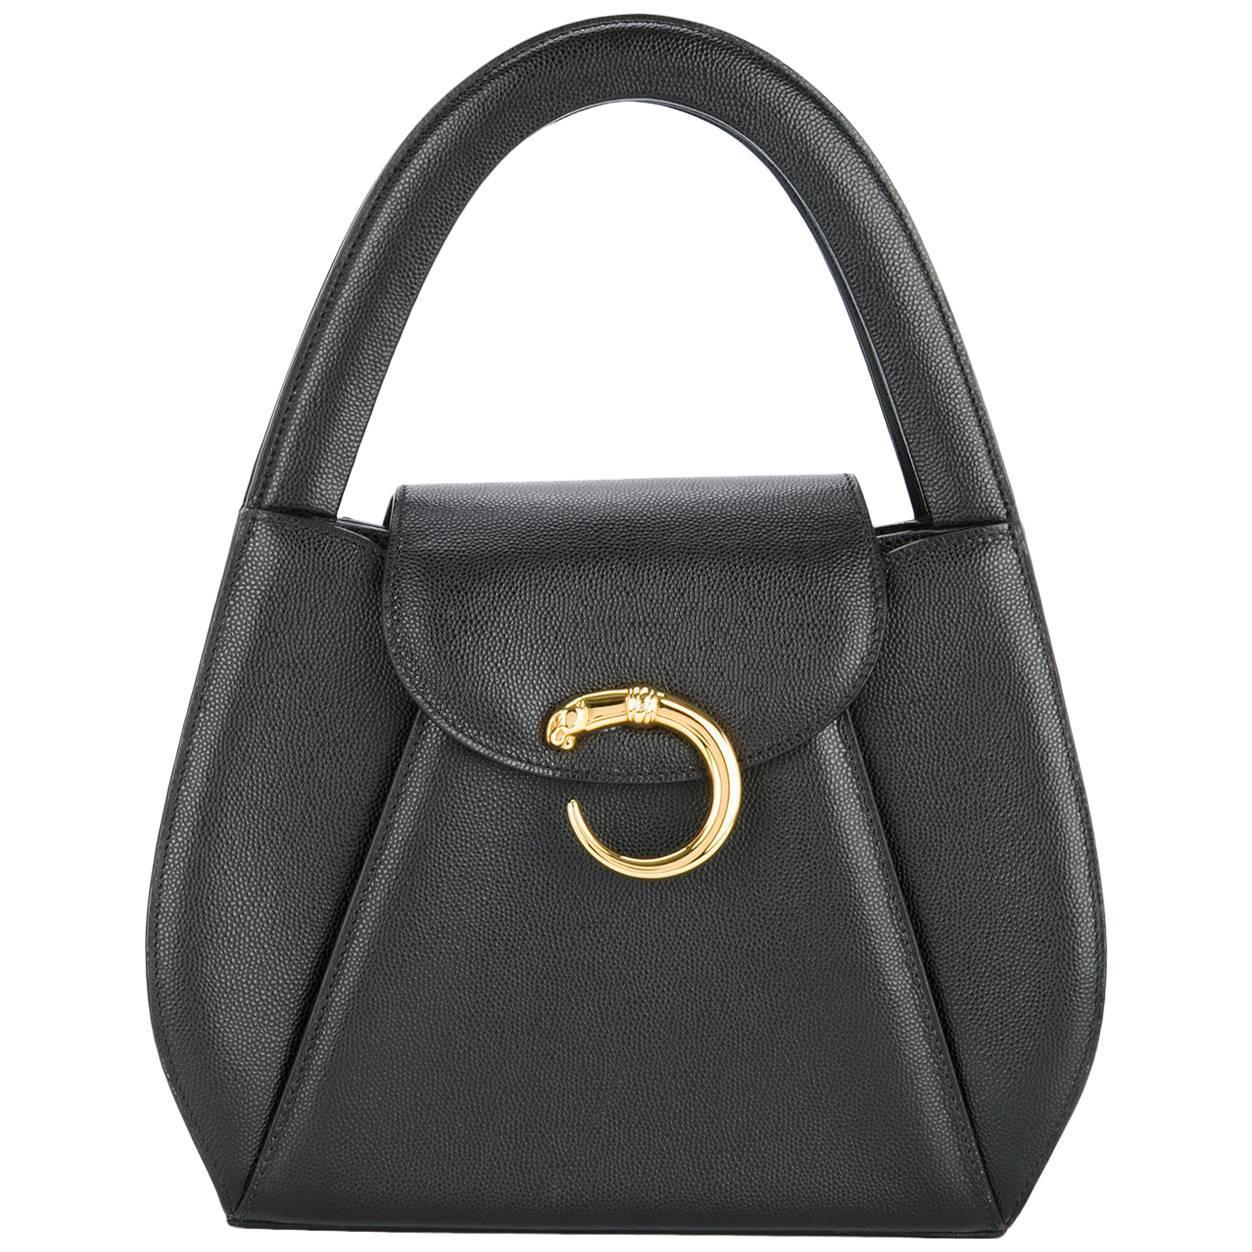 Cartier Black Leather Silver Emblem Evening Shoulder Bag In Box RWX8huYXHF